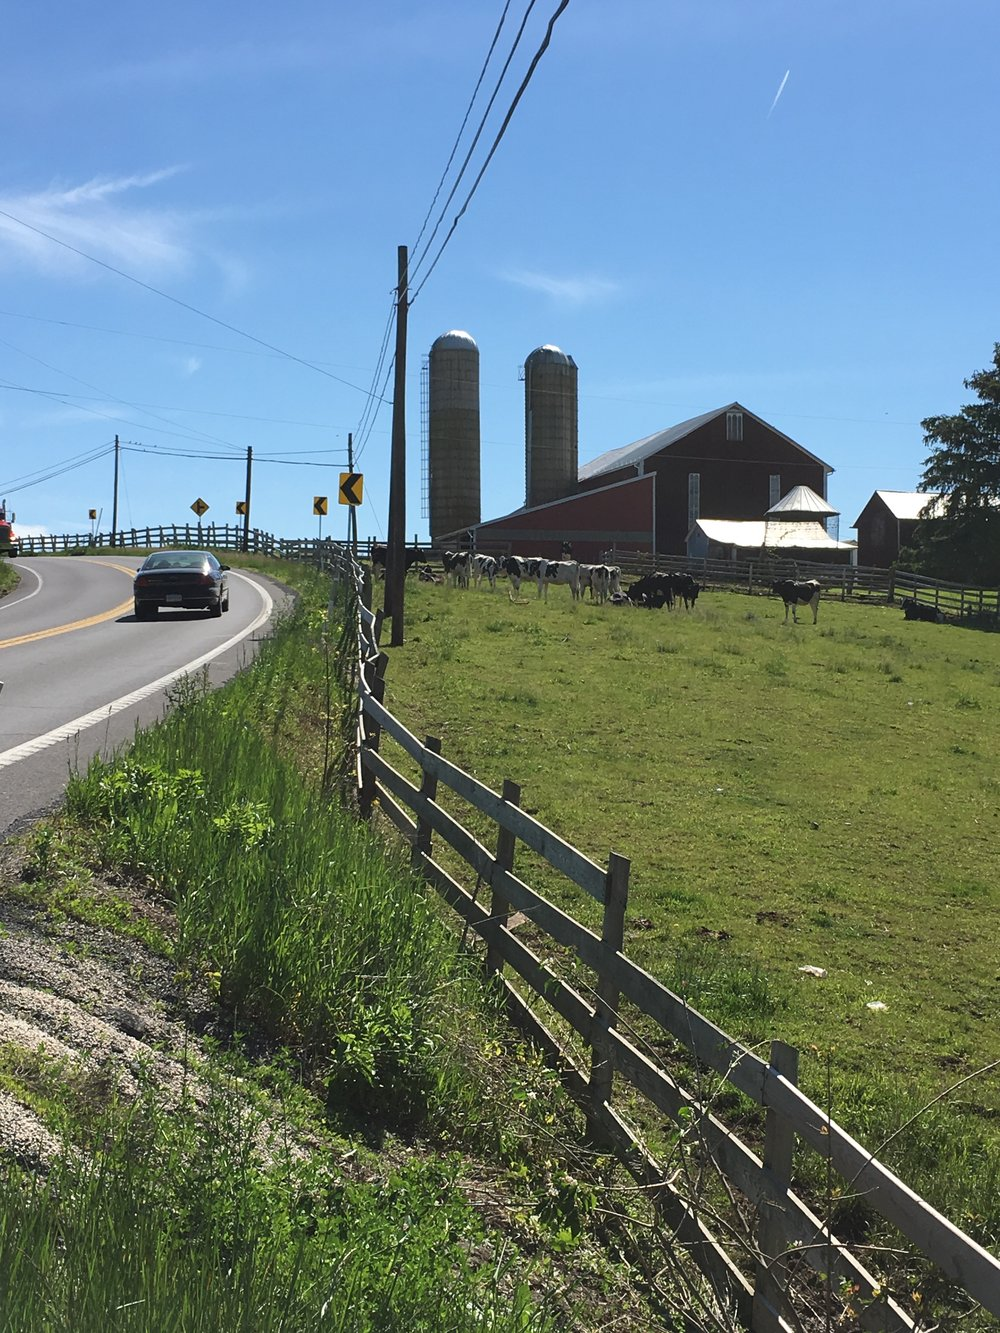 Elliottsburg farm, Perry County